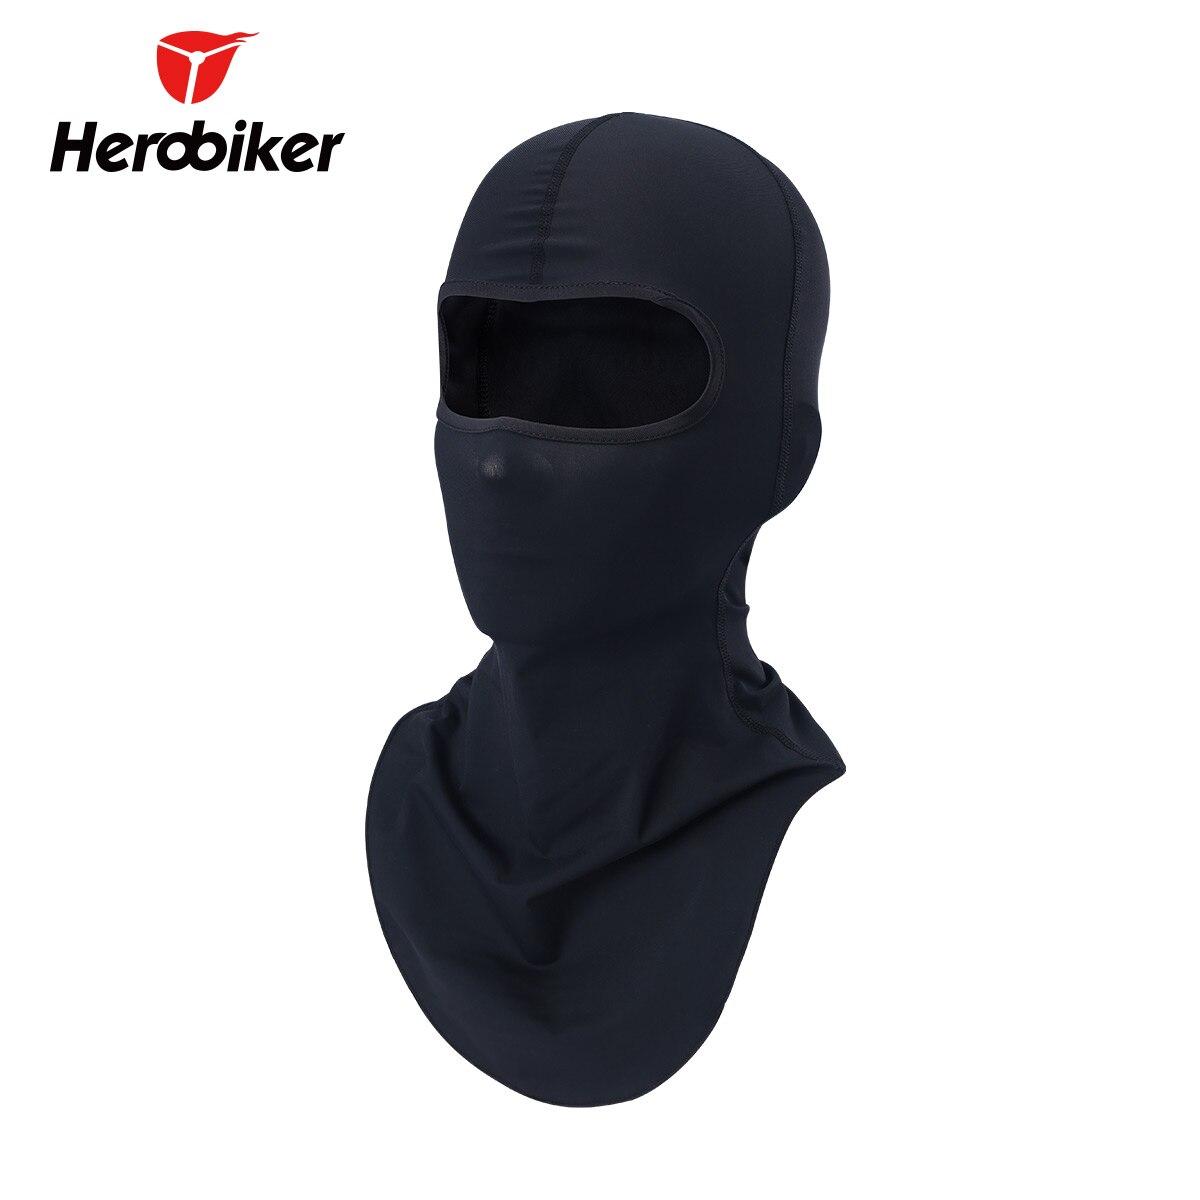 HEROBIKER Men Black Balaclava Moto Mask Windproof Face Mask Motorcycle Face Mask Cycling Bike Skiing Military Tactical Paintball